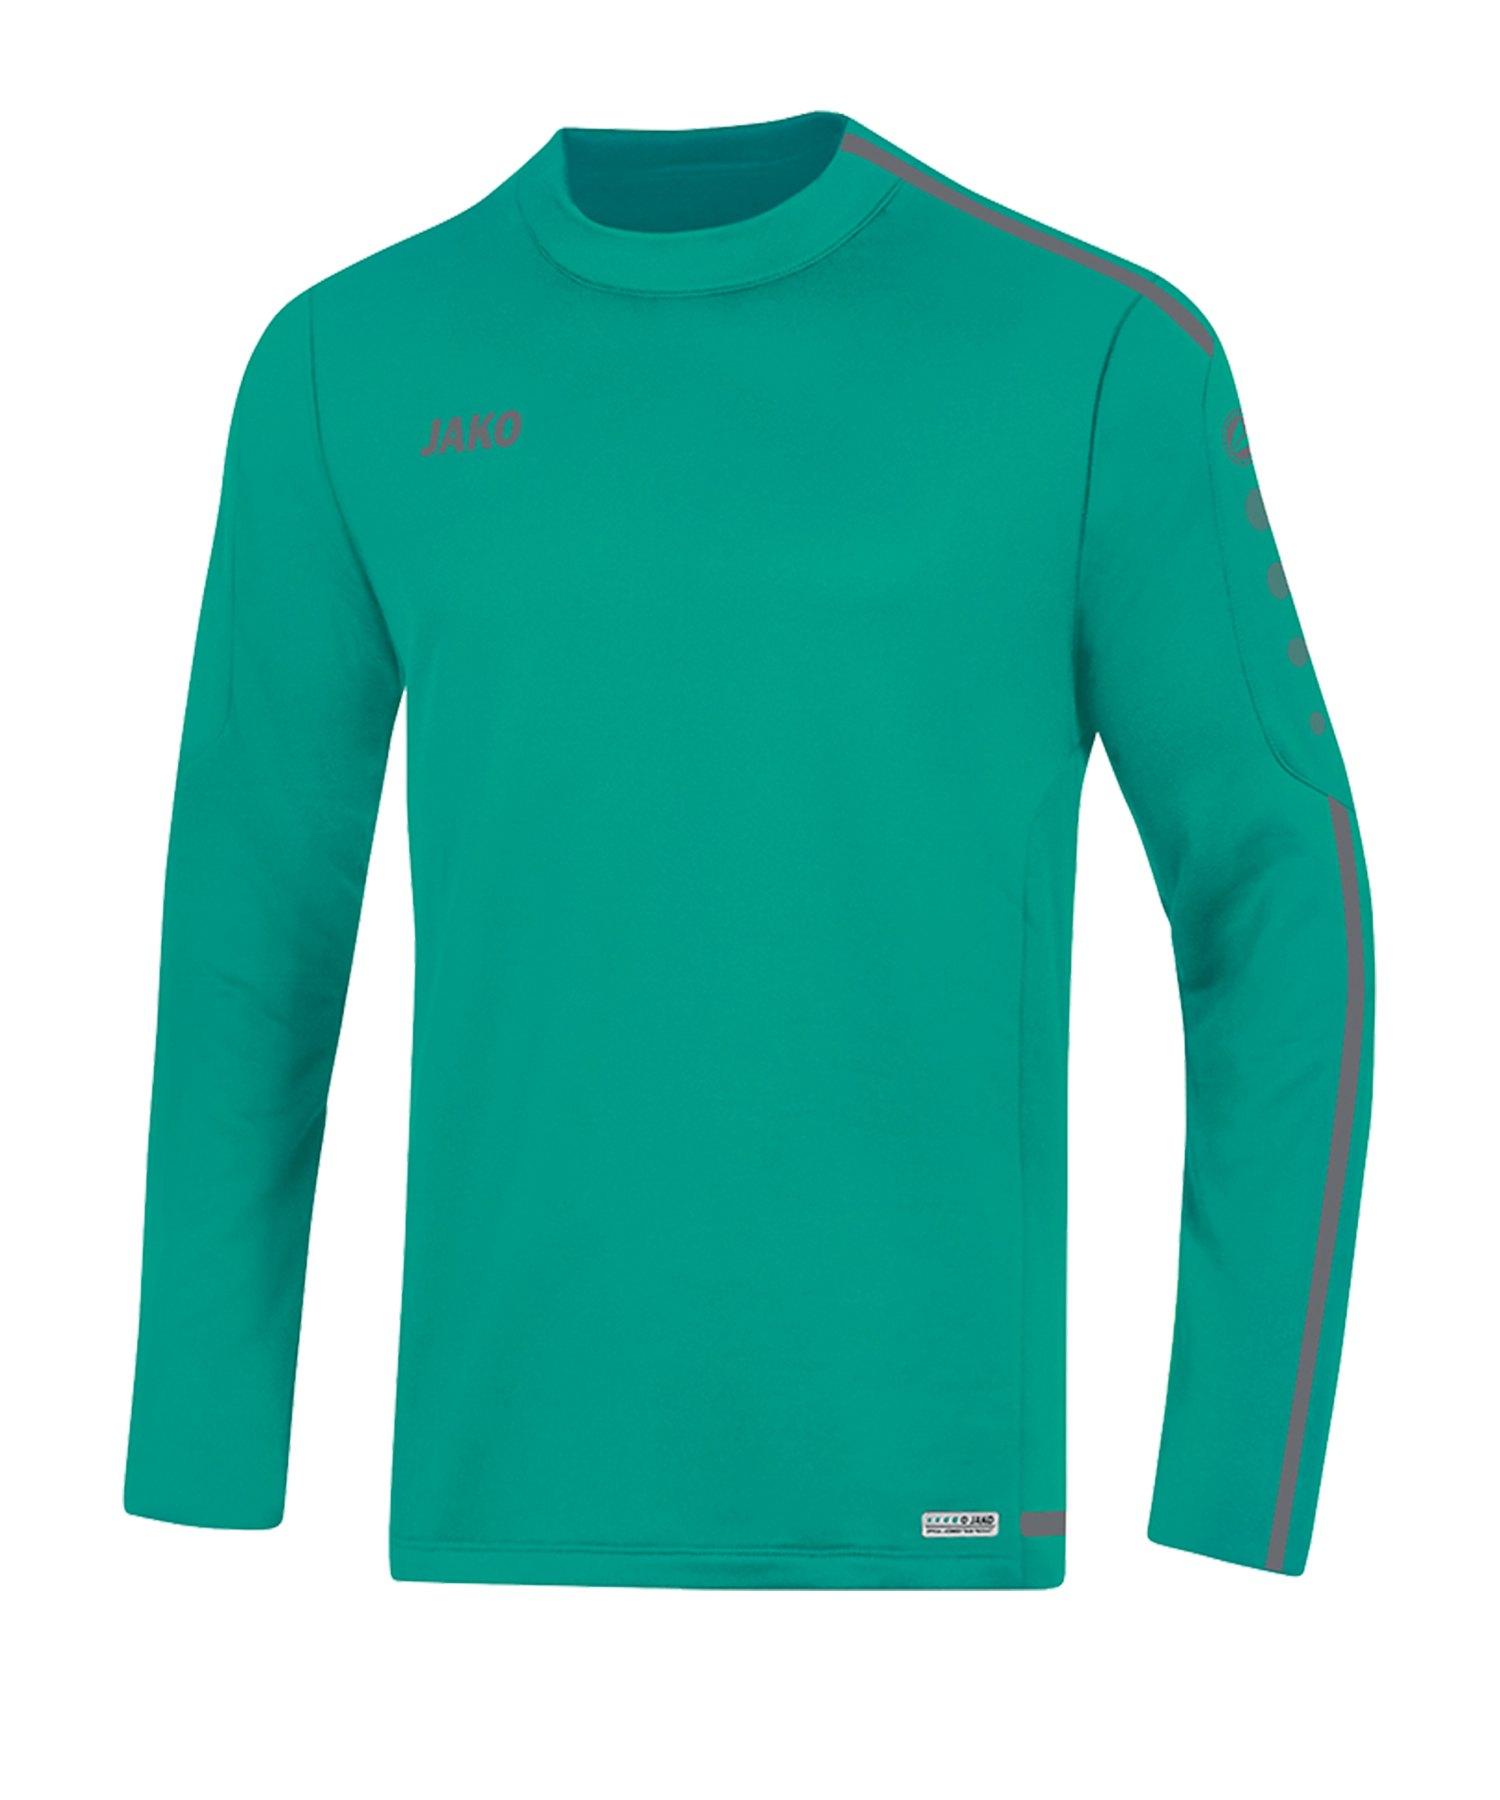 Jako Striker 2.0 Sweatshirt Kids Türkis Grau F24 - Grau